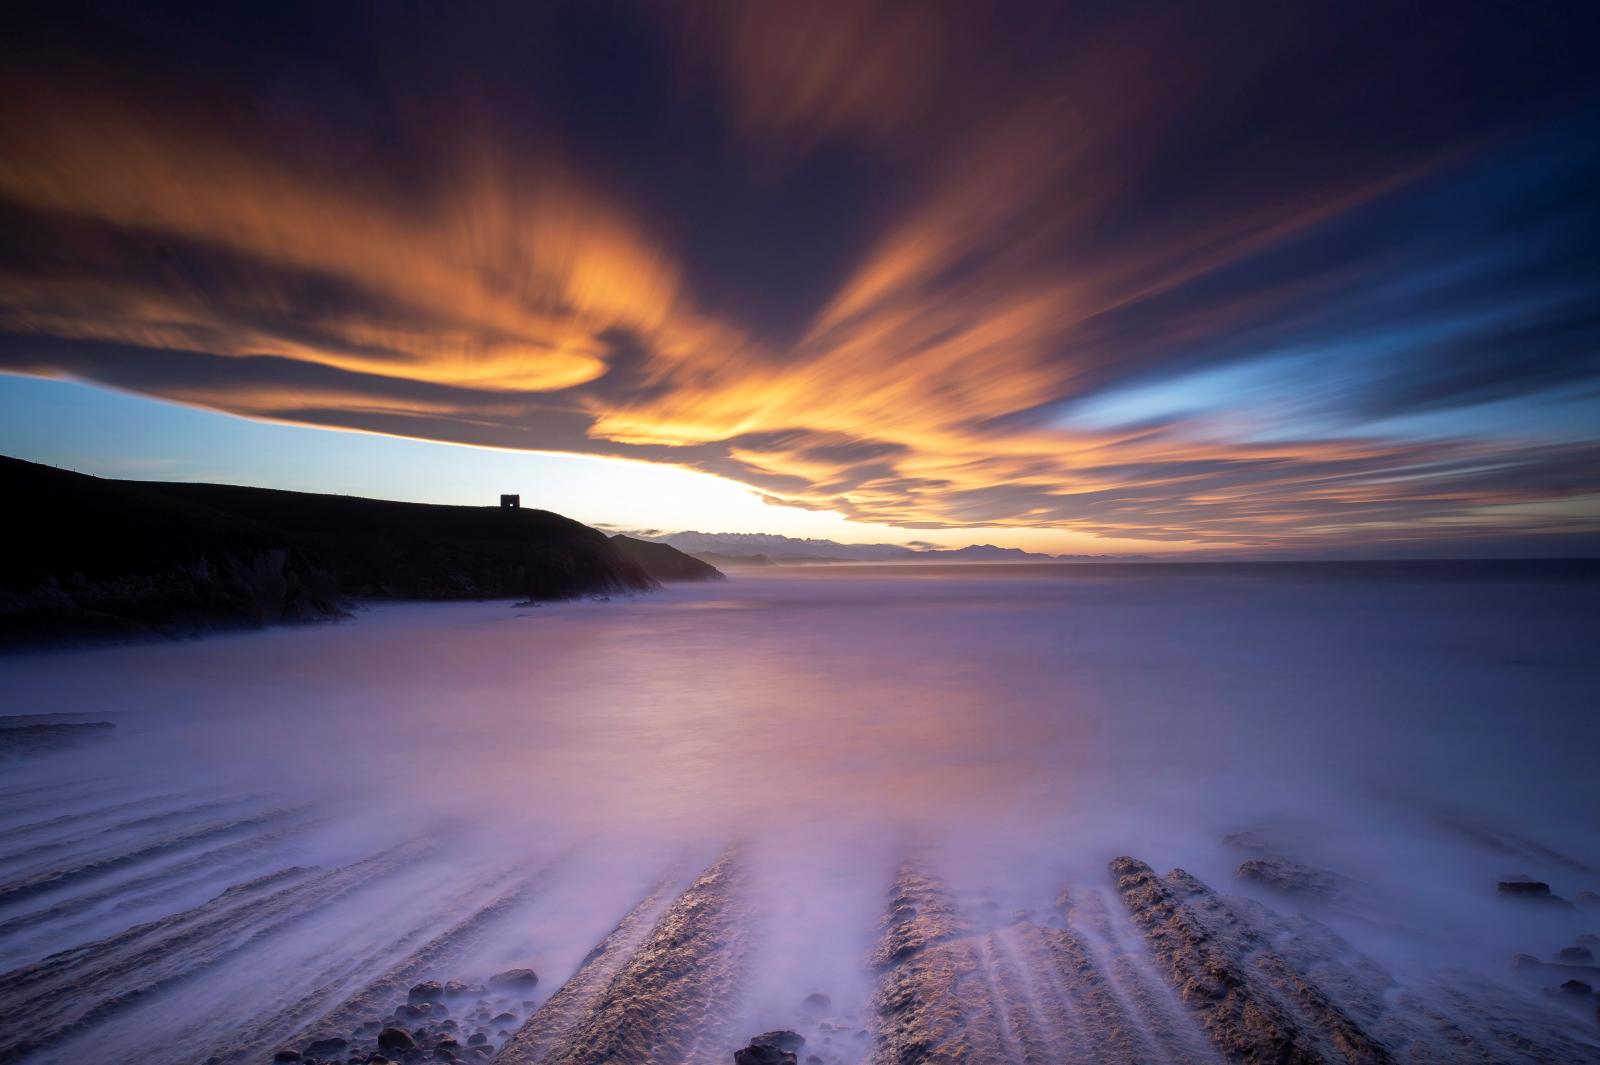 Zachód słońca w Hiszpanii fot. EPA/Pedro Puente Hoyos